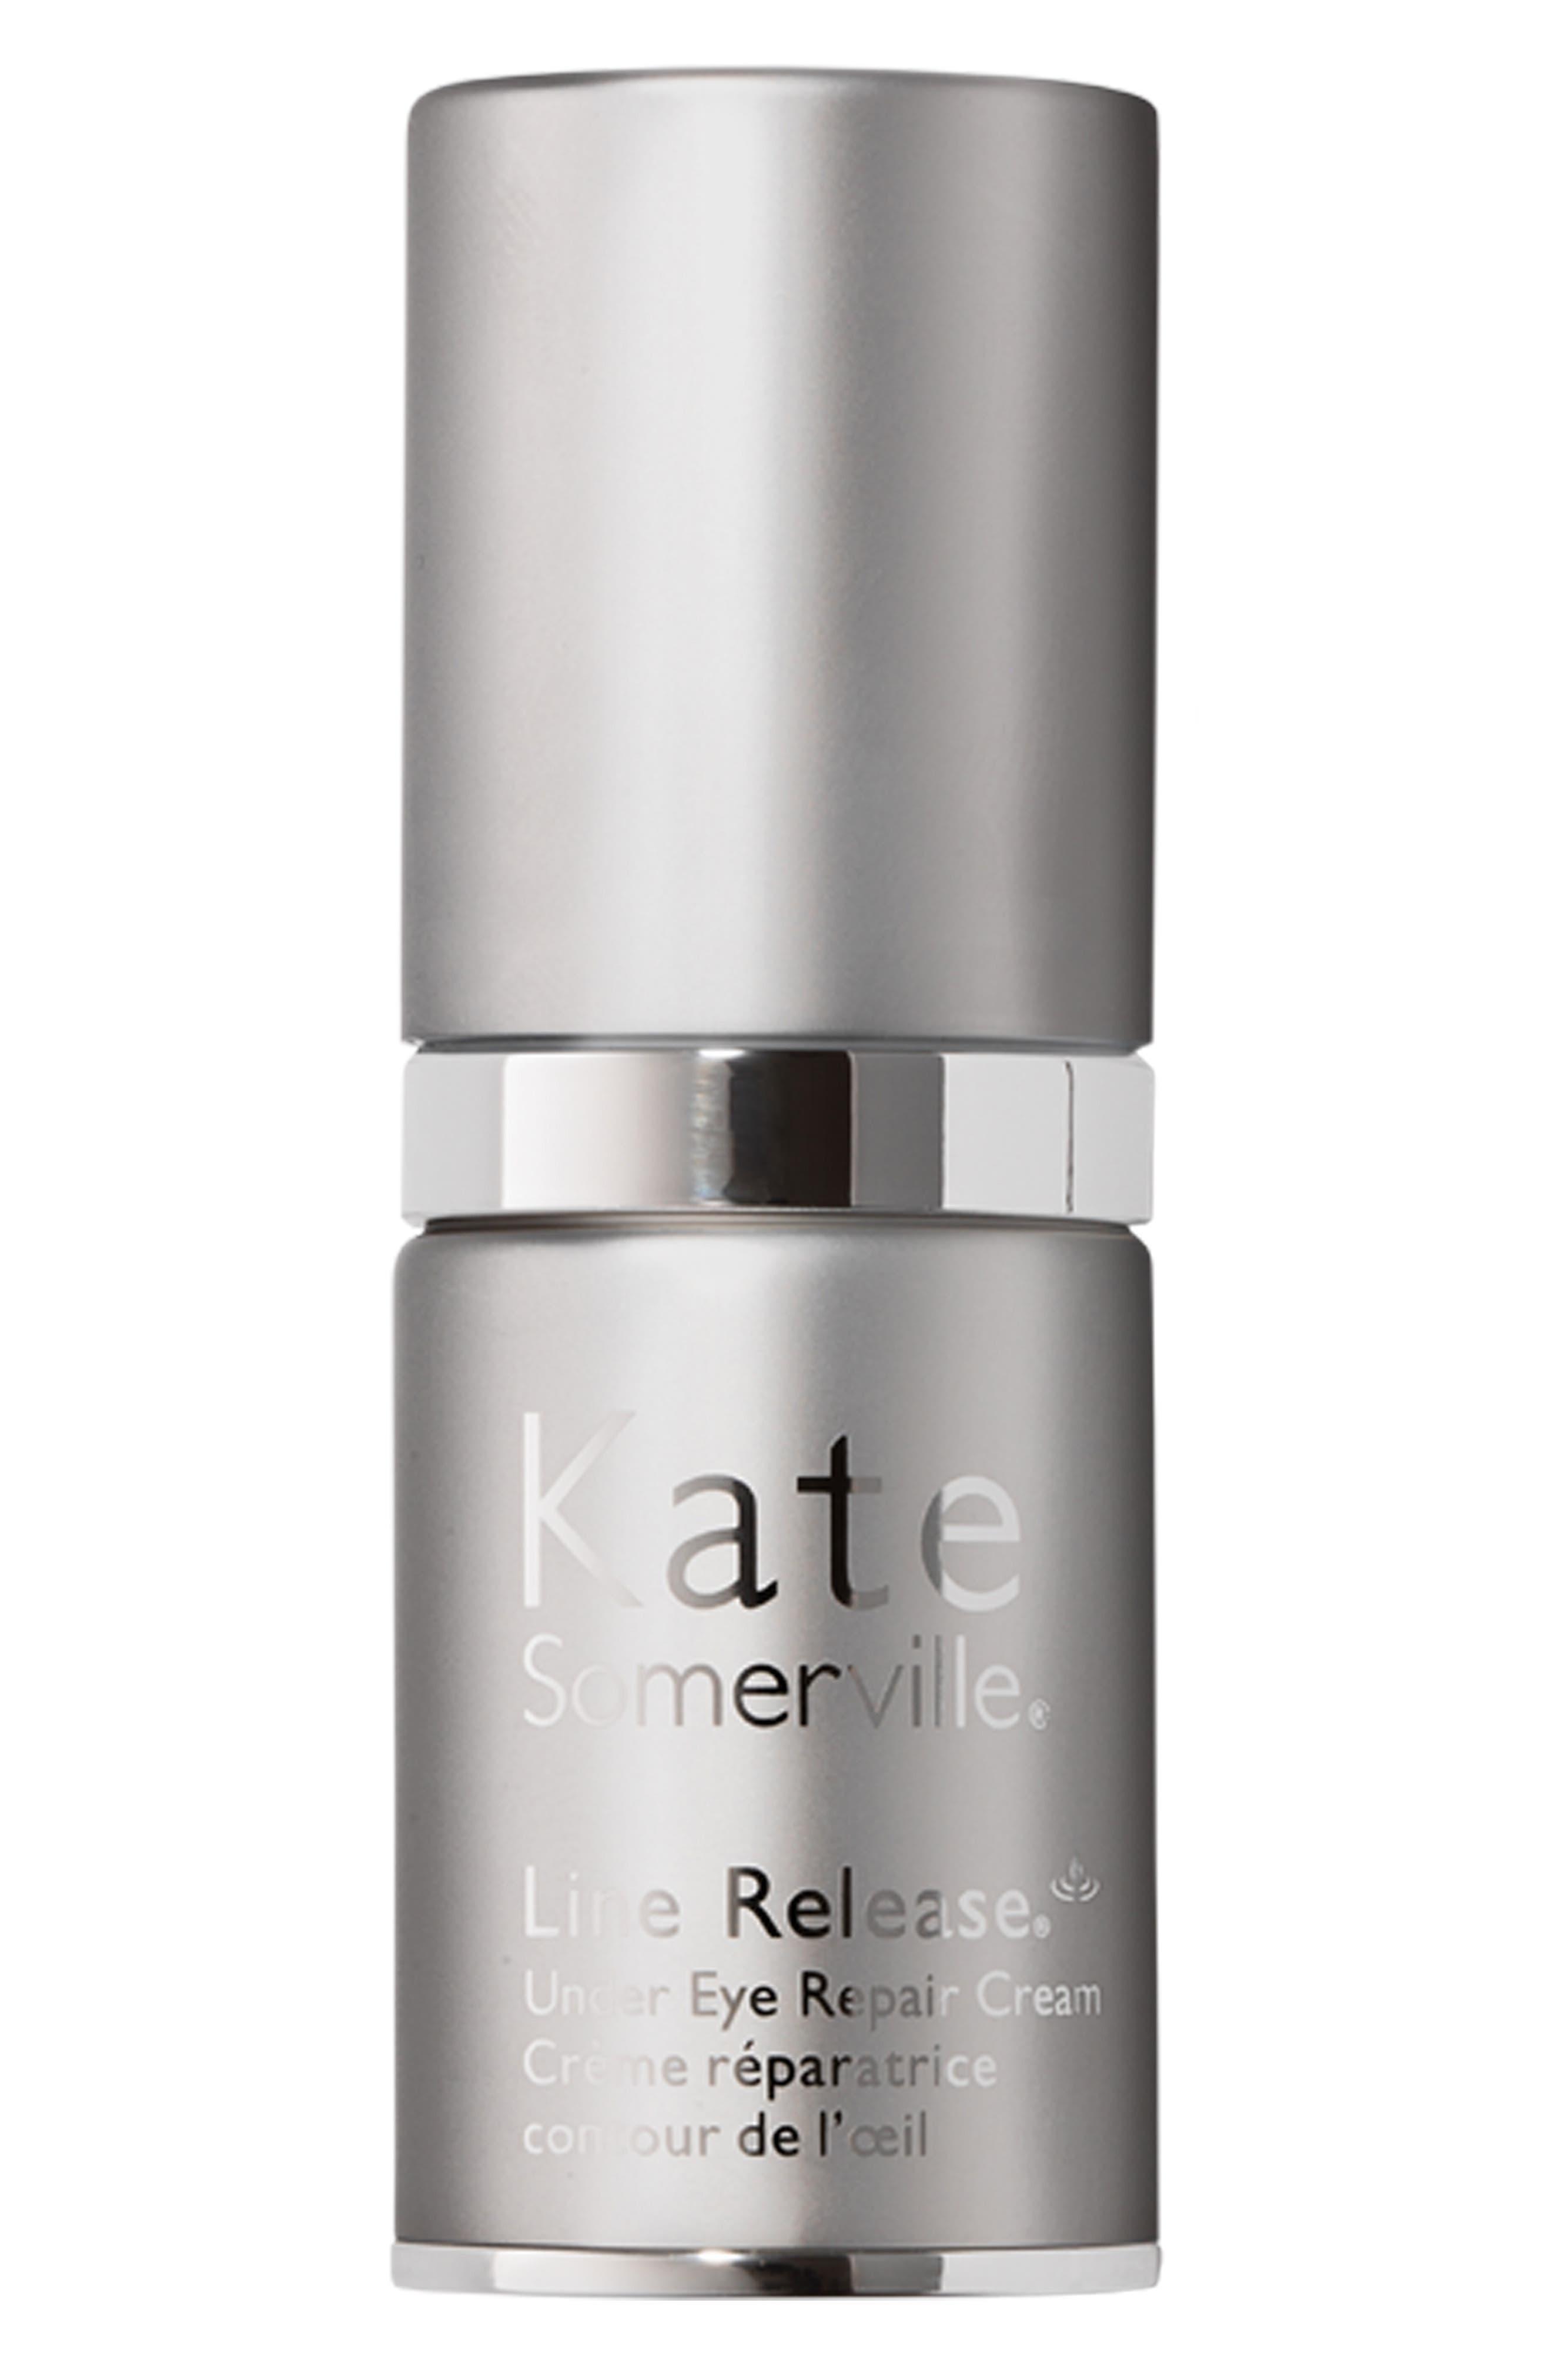 Kate Somerville Line Release Under Eye Repair Cream